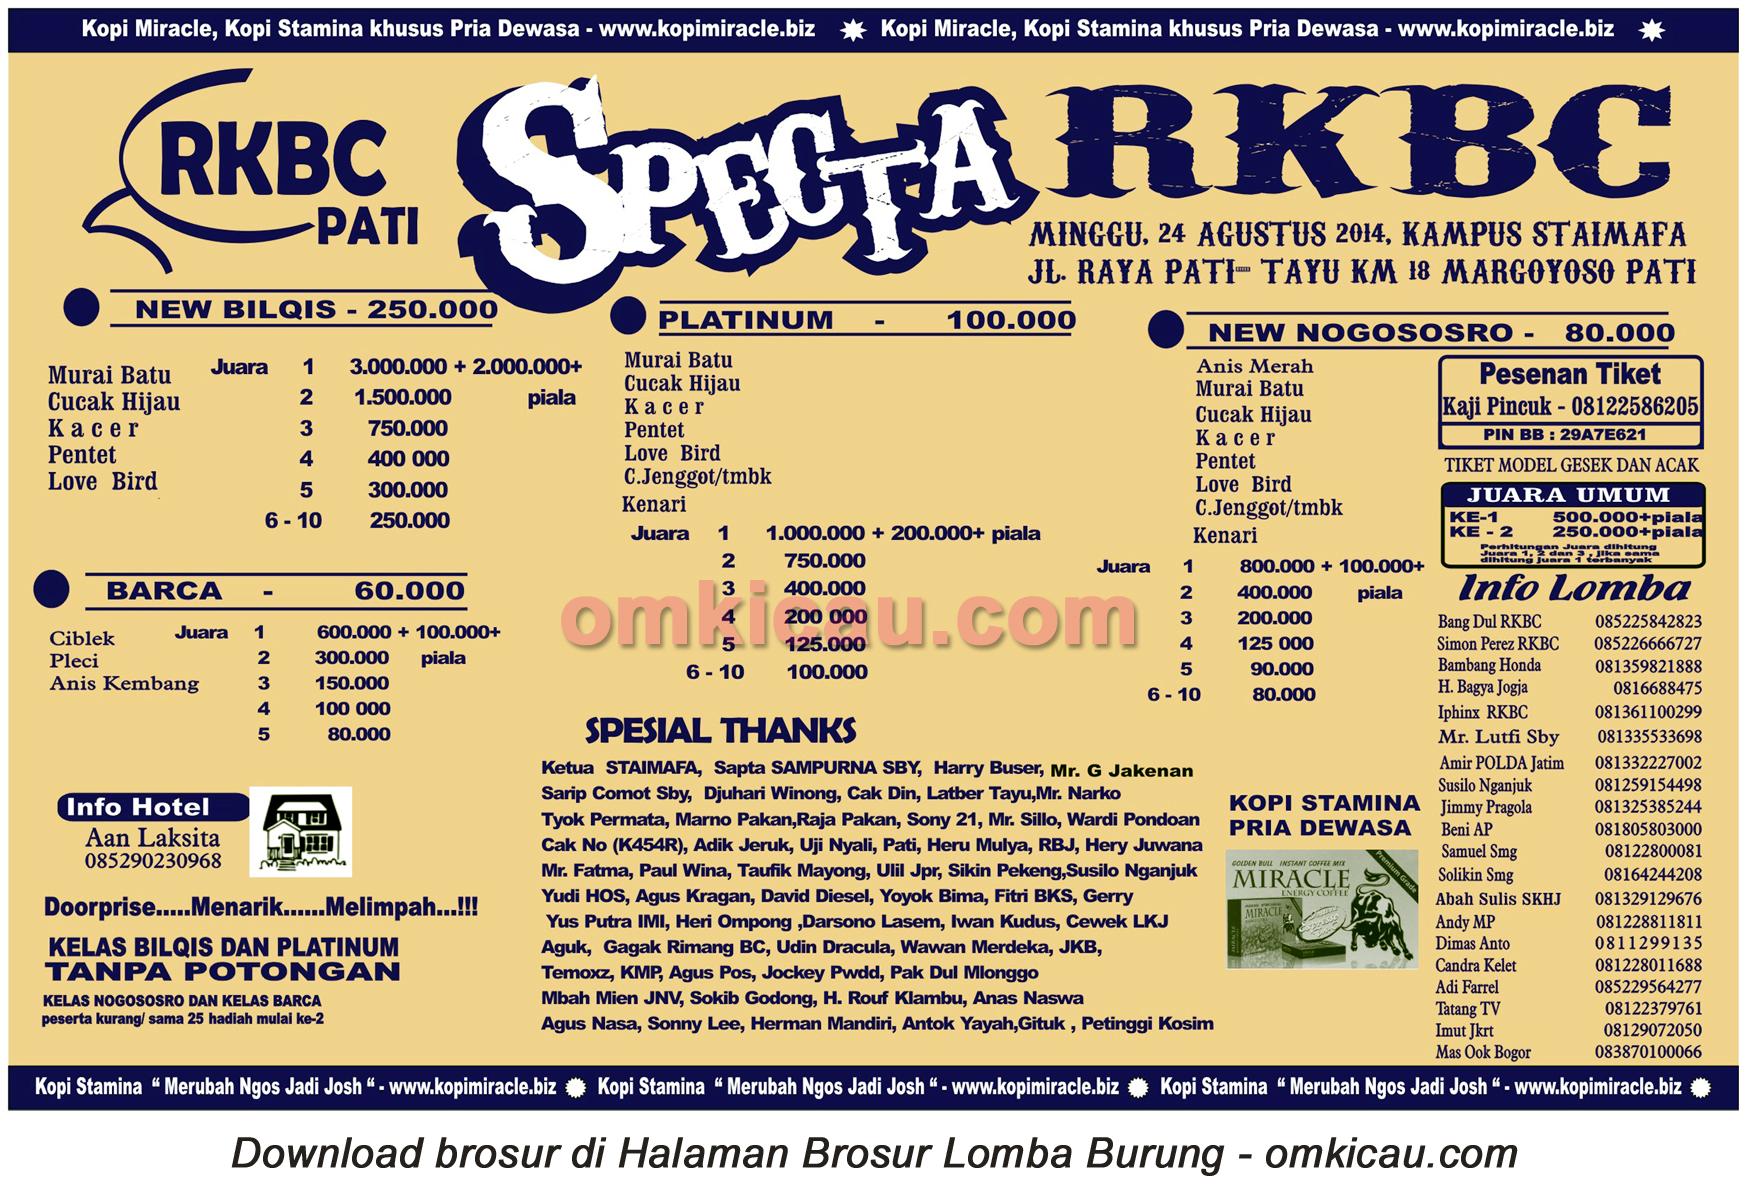 Brosur Lomba Burung Berkicau Specta RKBC, Pati, 24 Agustus 2014